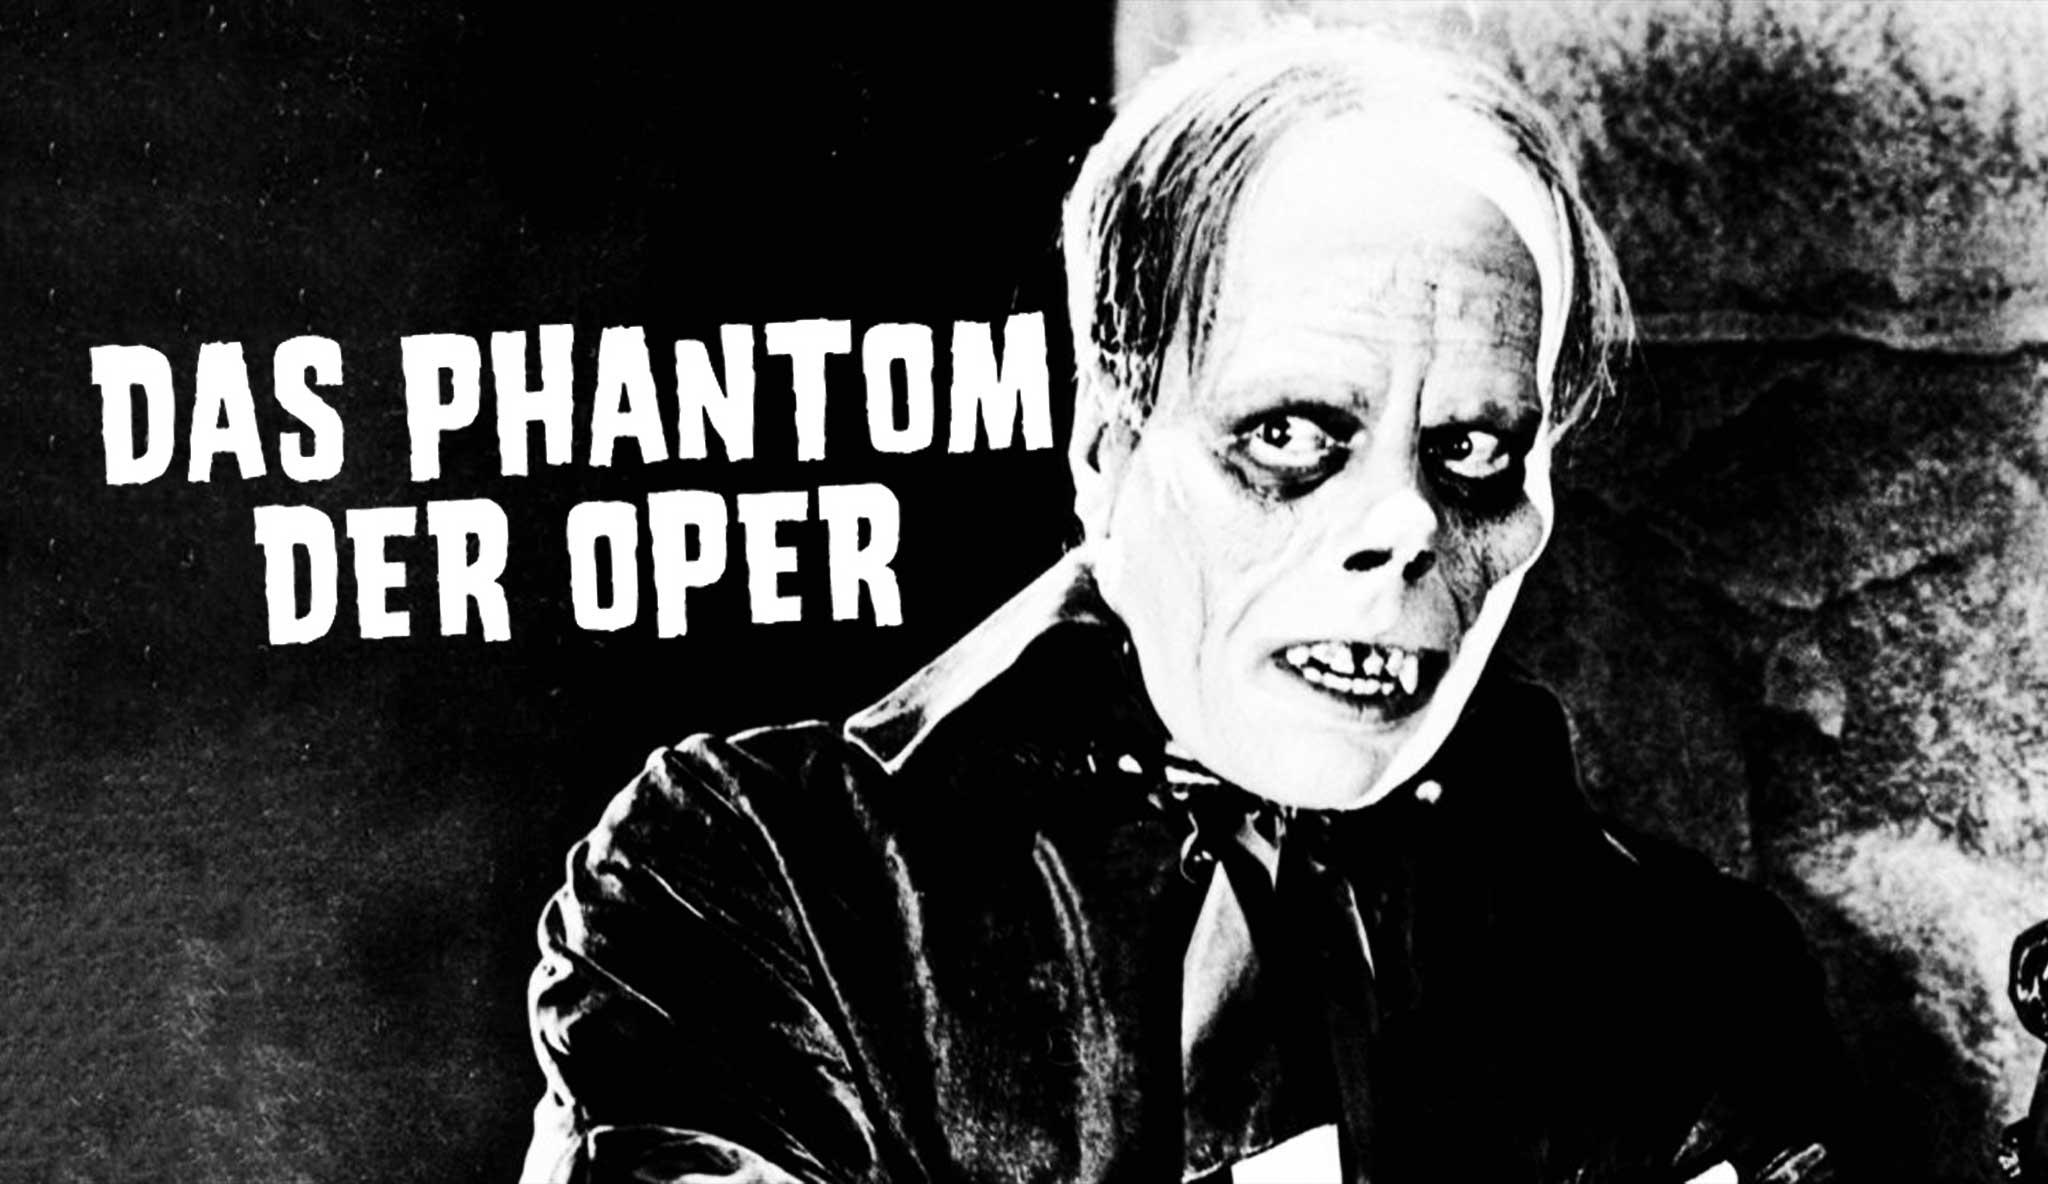 das-phantom-der-oper\header.jpg